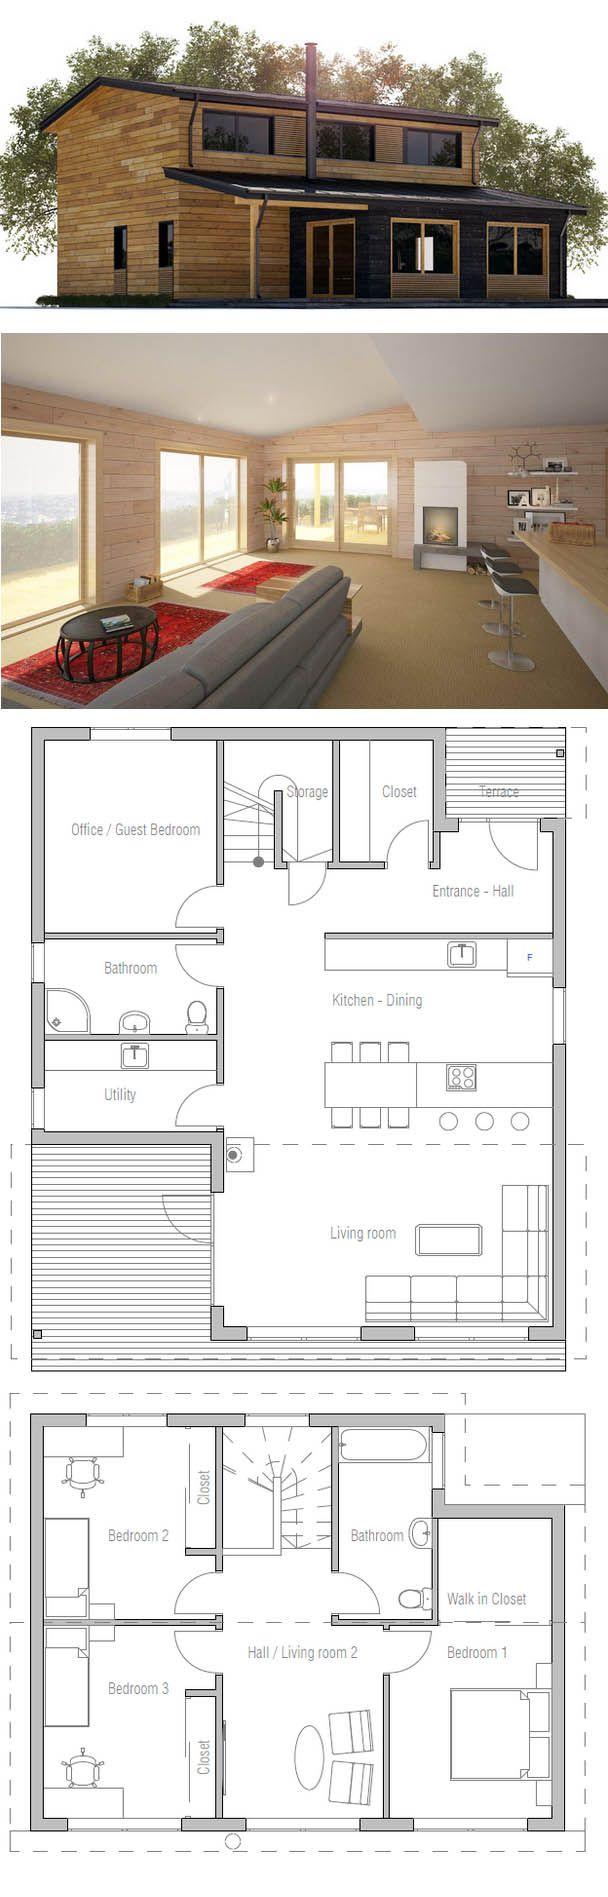 Plan de maison kingoftintgc httpwww kingoftint com